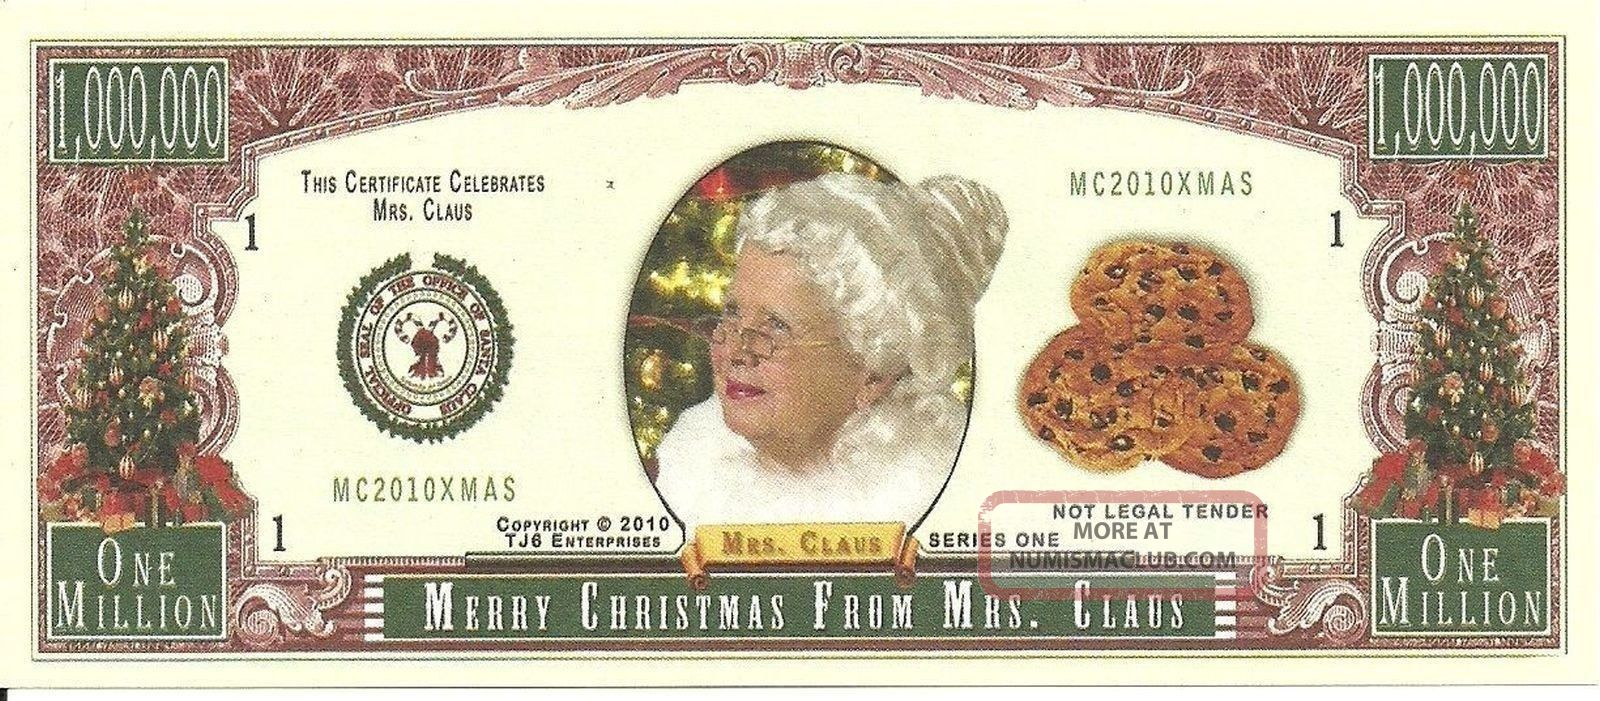 Novelty Usapaper Money Tj6 2010 Mrs Santa Clauss Christmas Million Banknote Paper Money: US photo